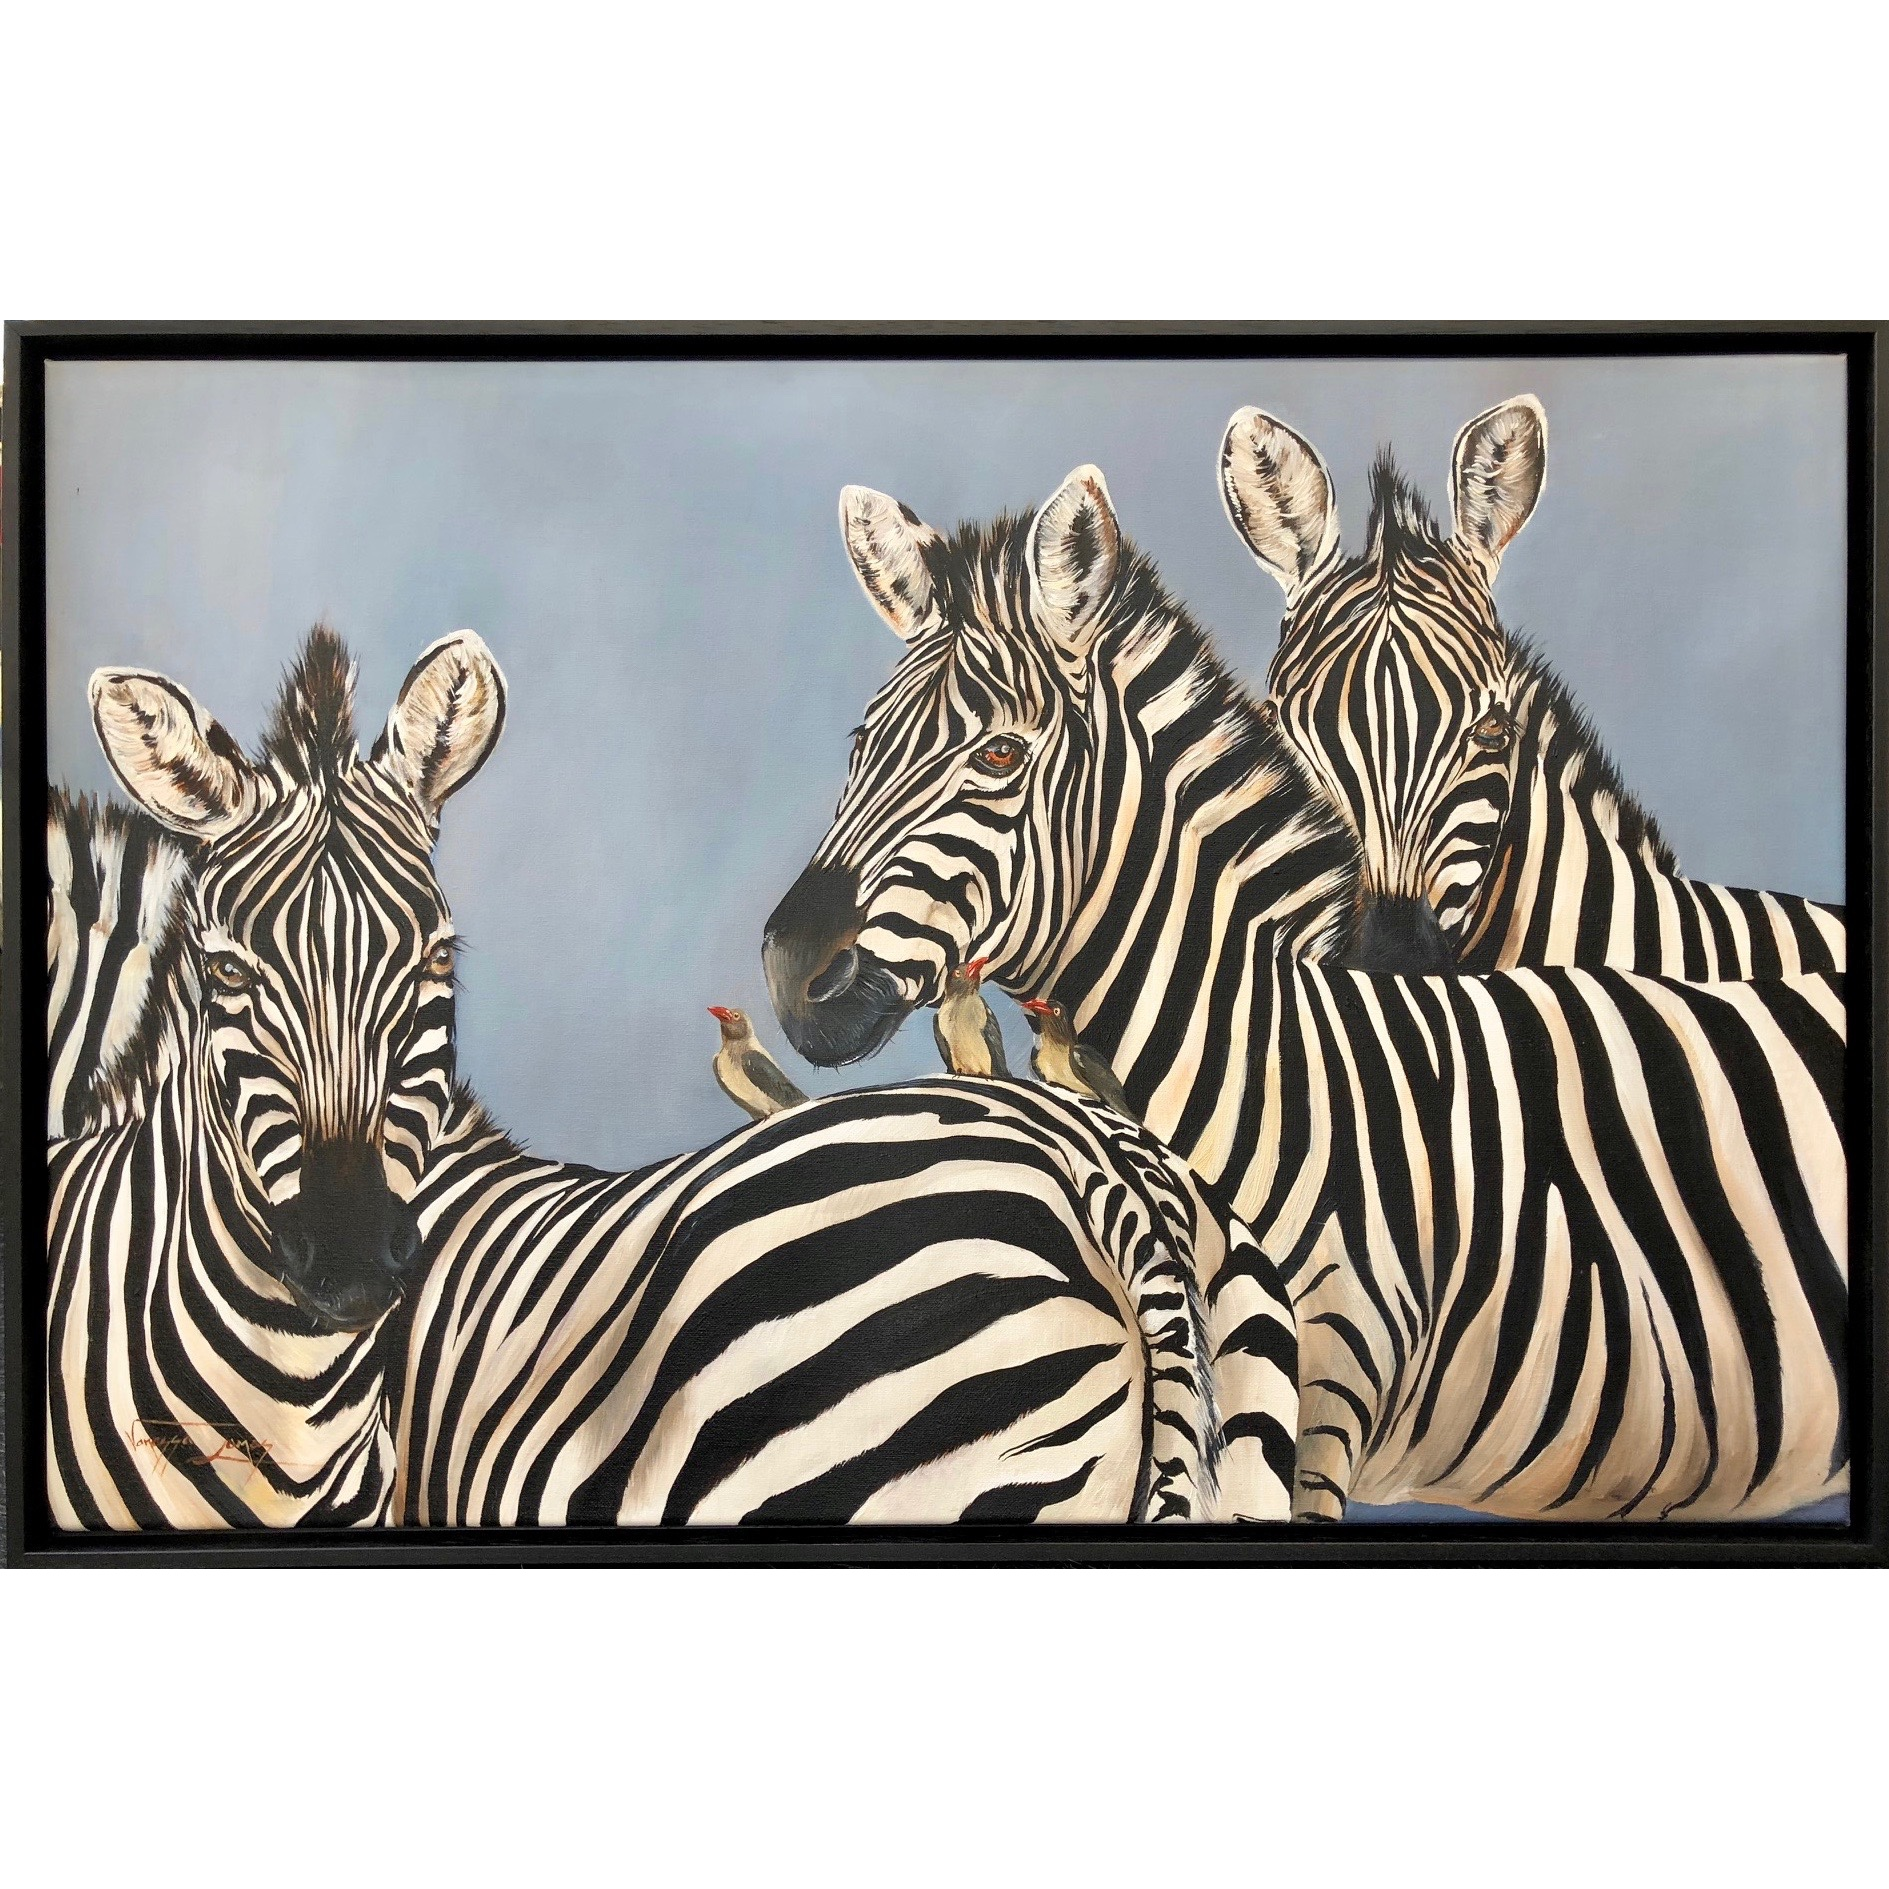 Vanessa Lomas schilderij 'Camouflage'